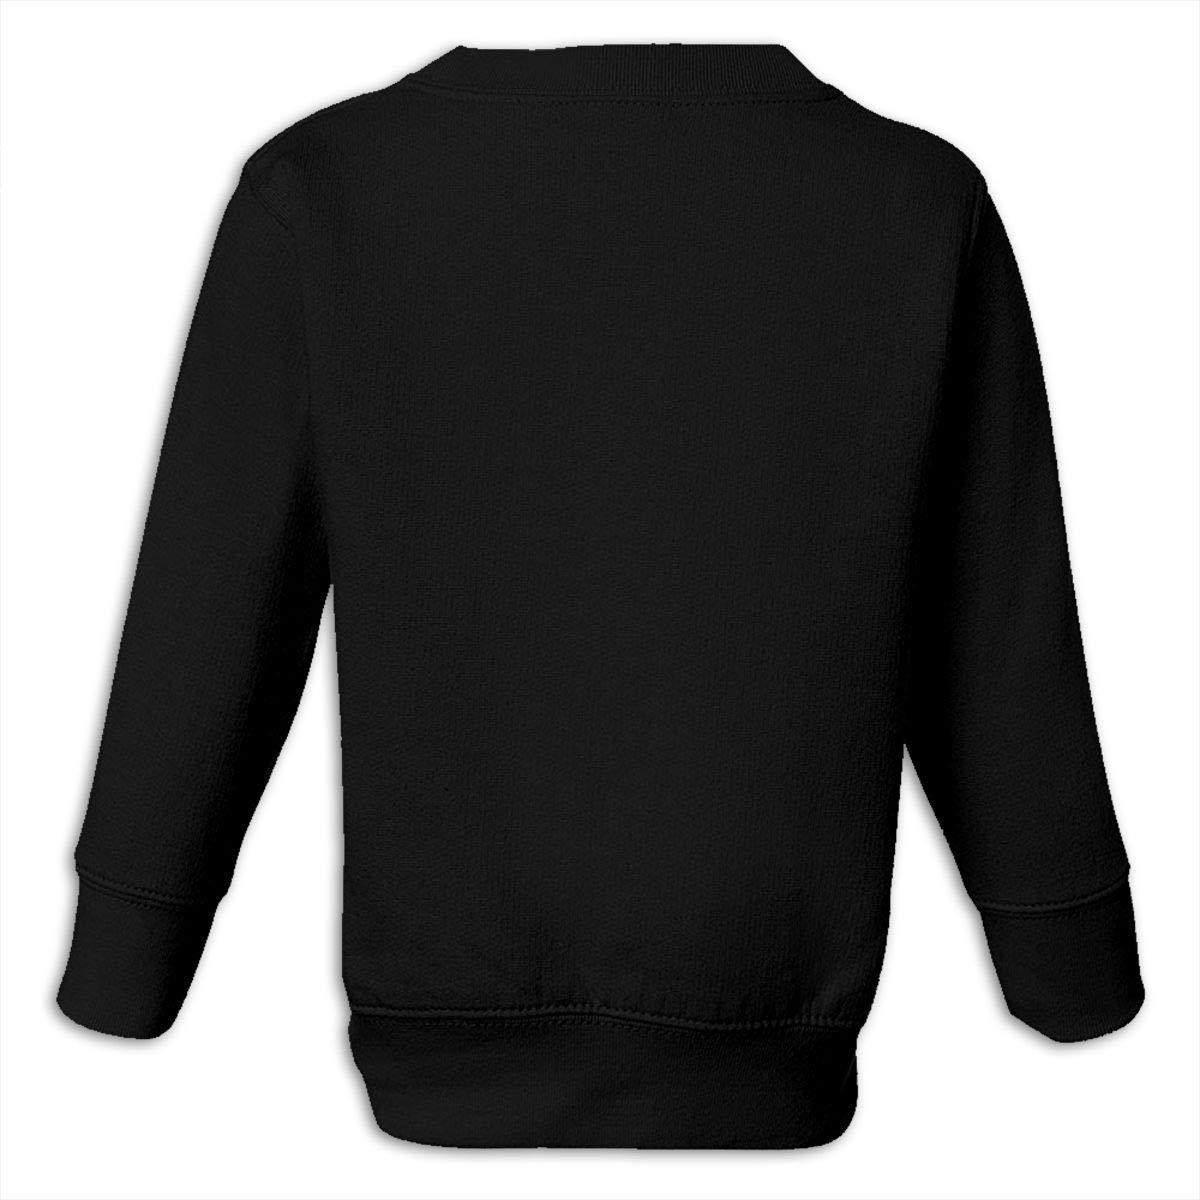 Fleece Pull Over Sweatshirt for Boys Girls Kids Youth Bohemian Elephant Unisex Toddler Hoodies